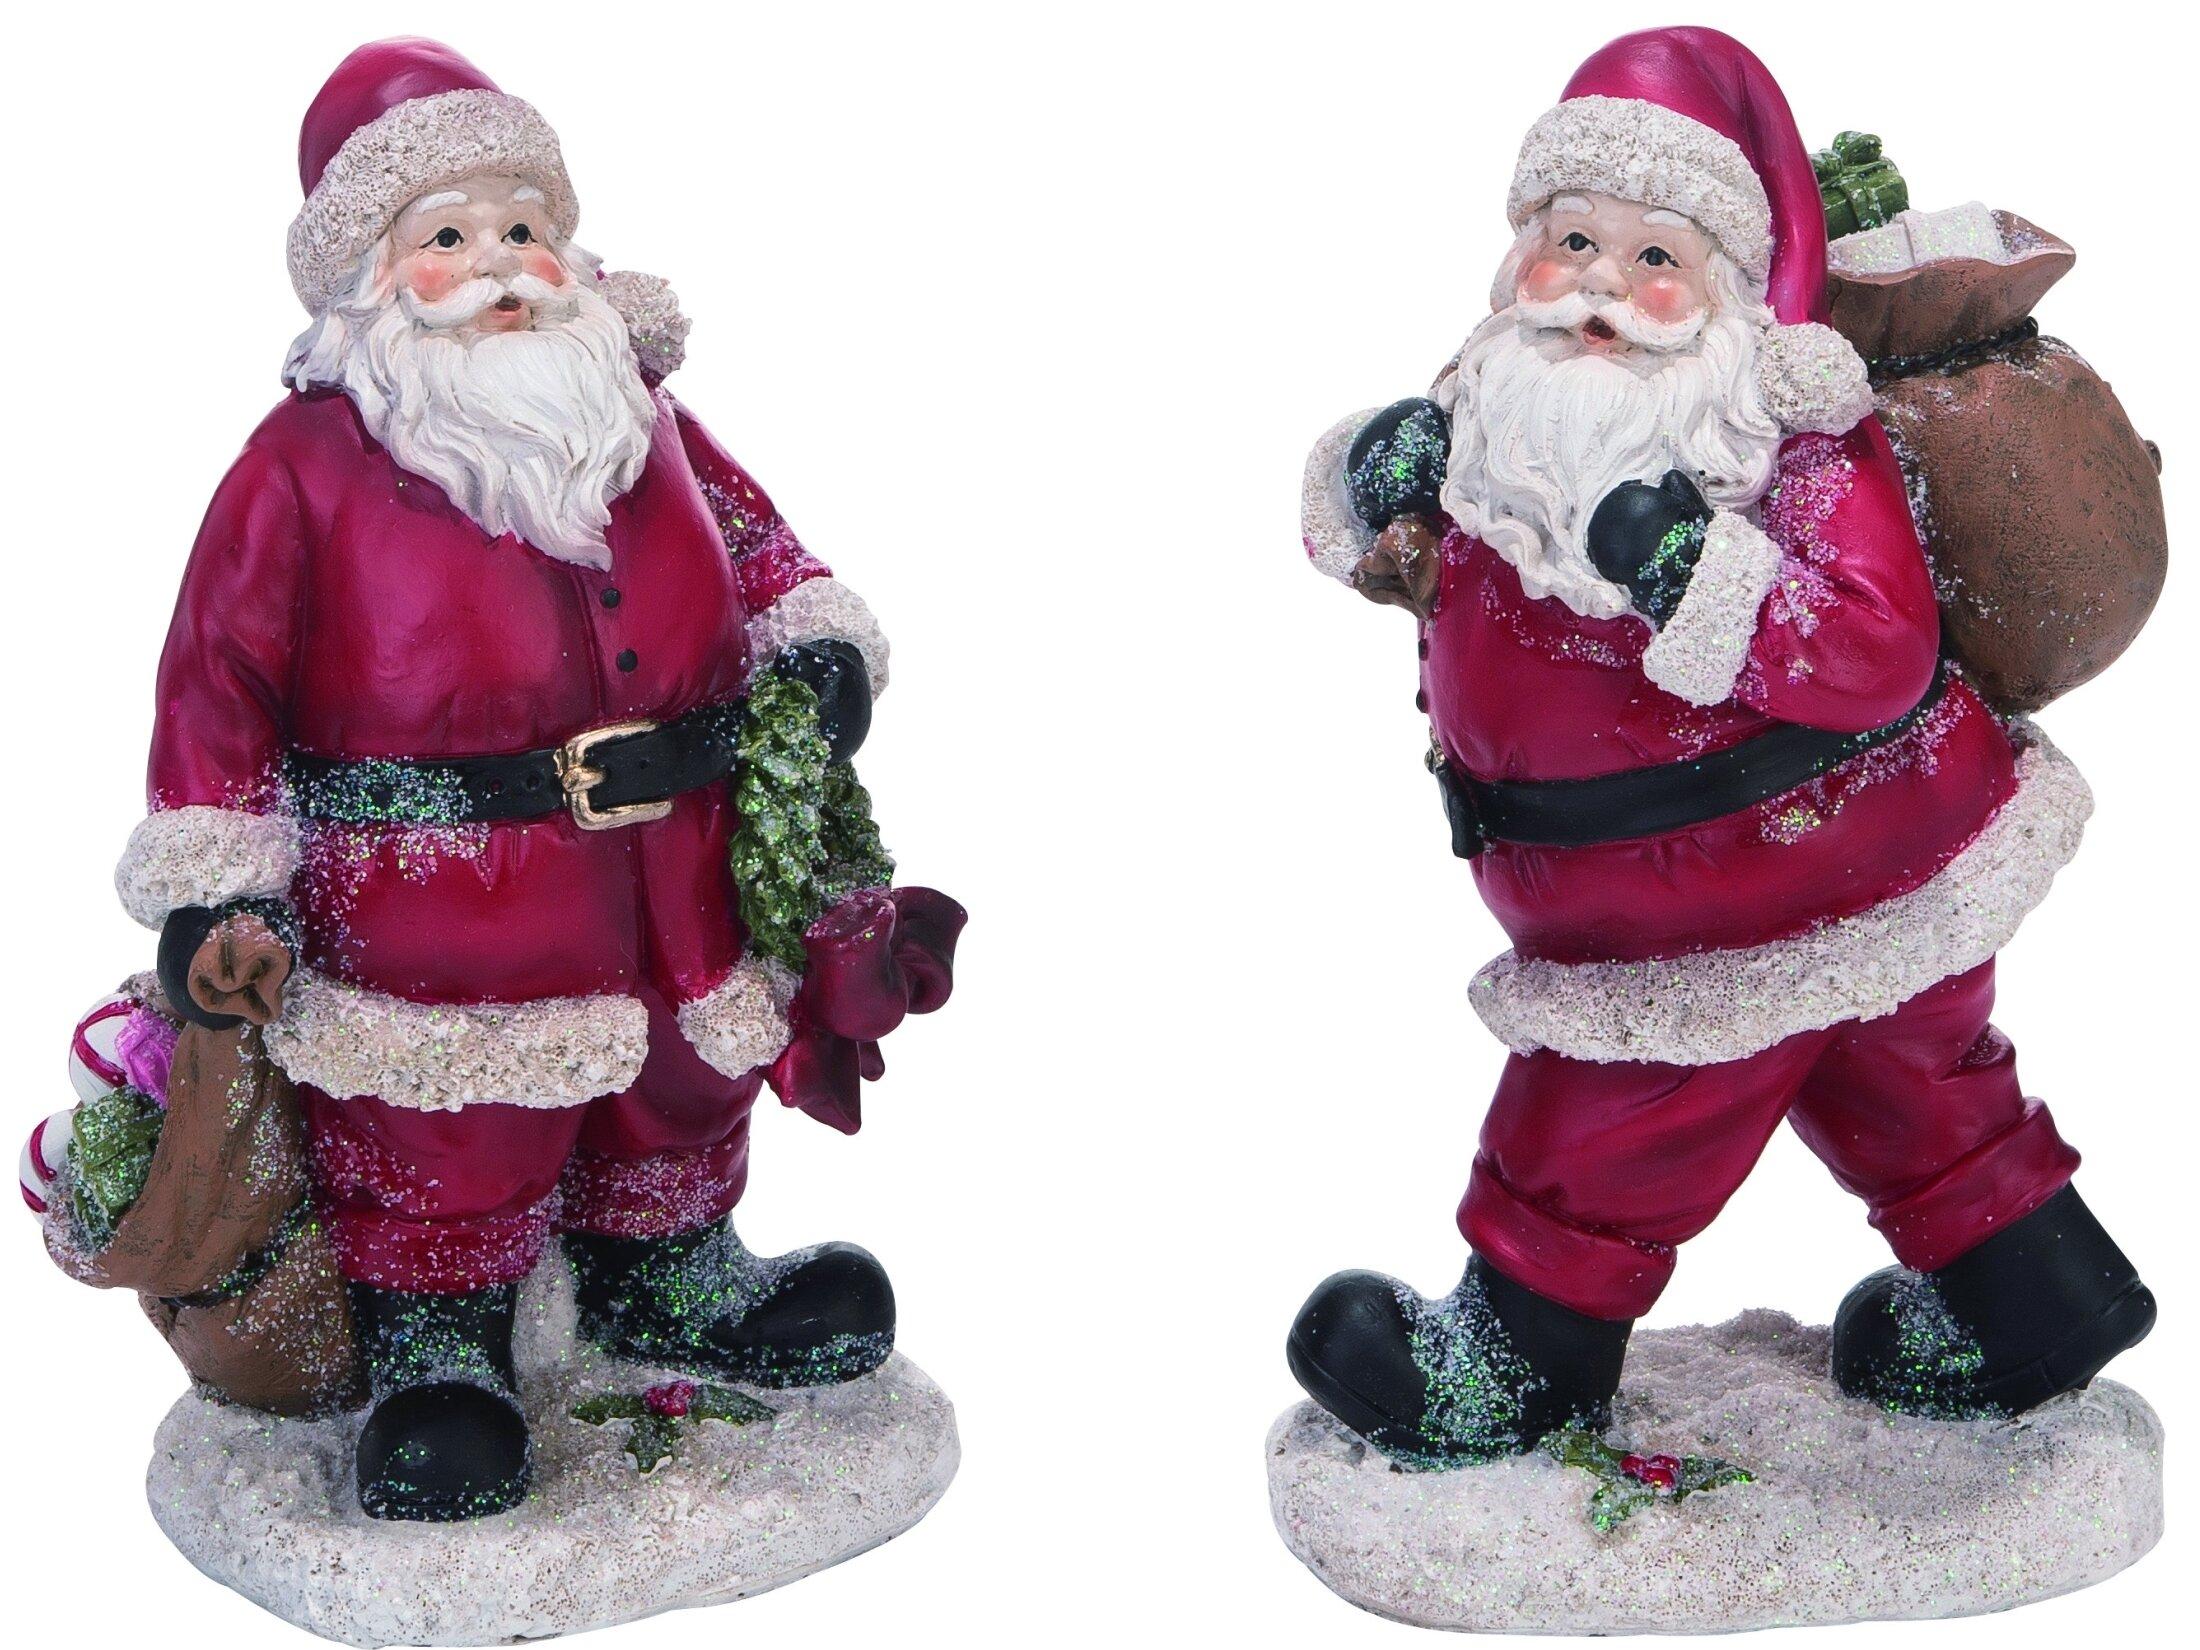 The Holiday Aisle 2 Piece Resin Christmas Vintage Santa Figurine Set Wayfair